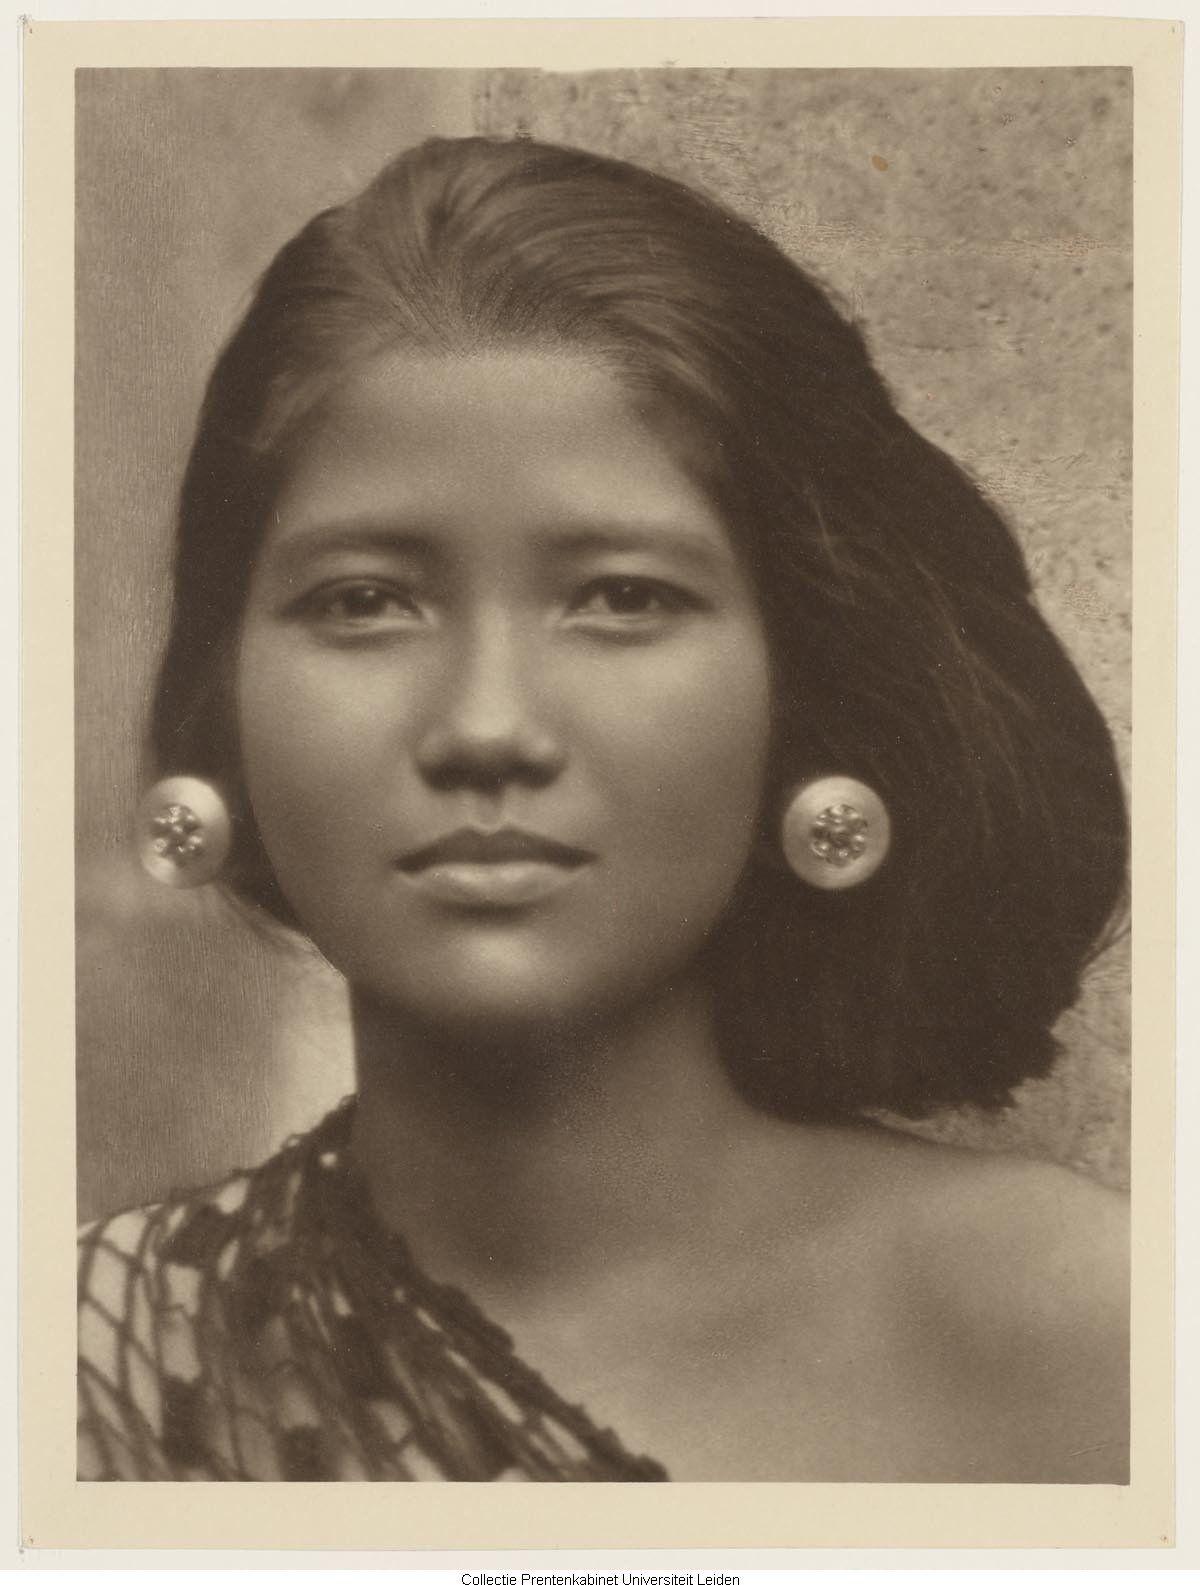 Dating indonesian ladies